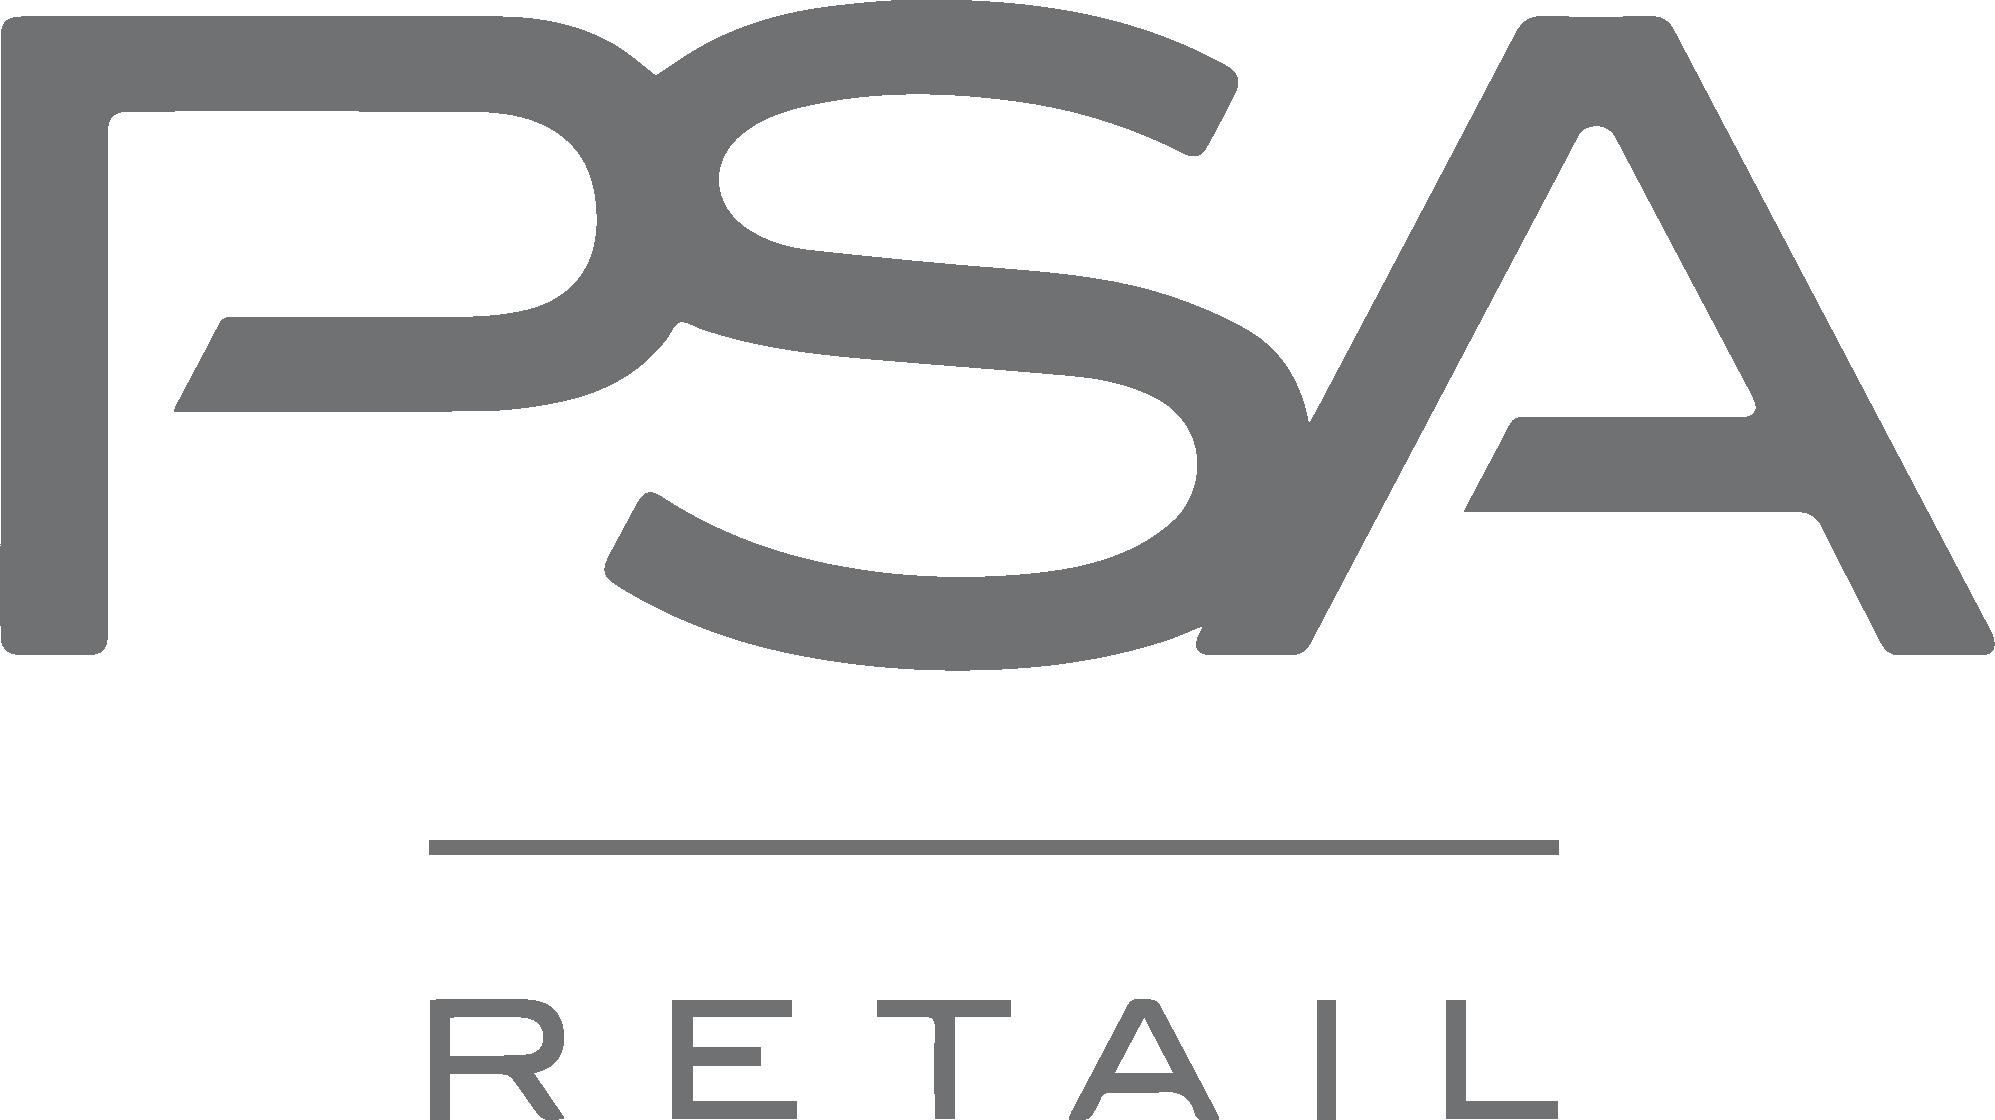 industree-change-psa-retail-1